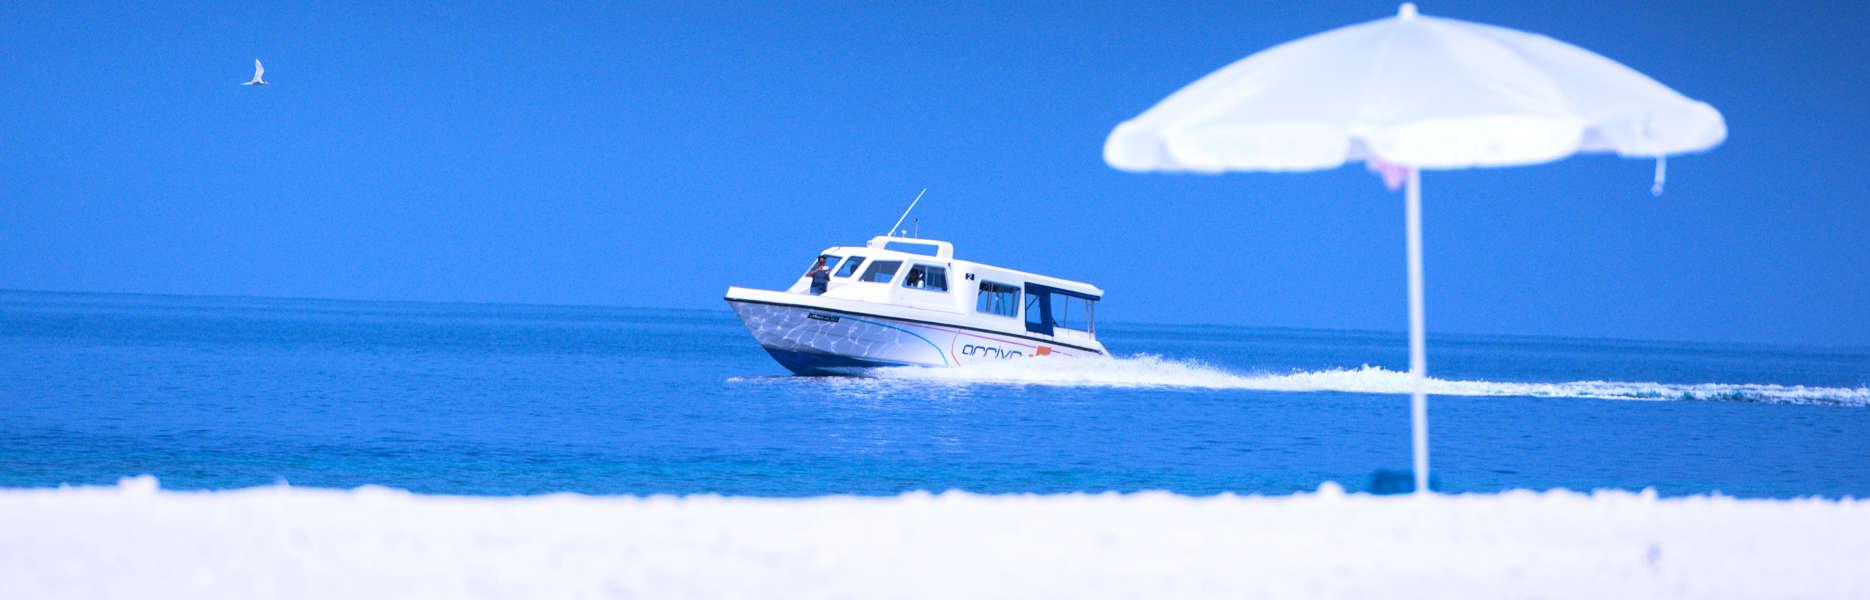 Boat charter, Maldives